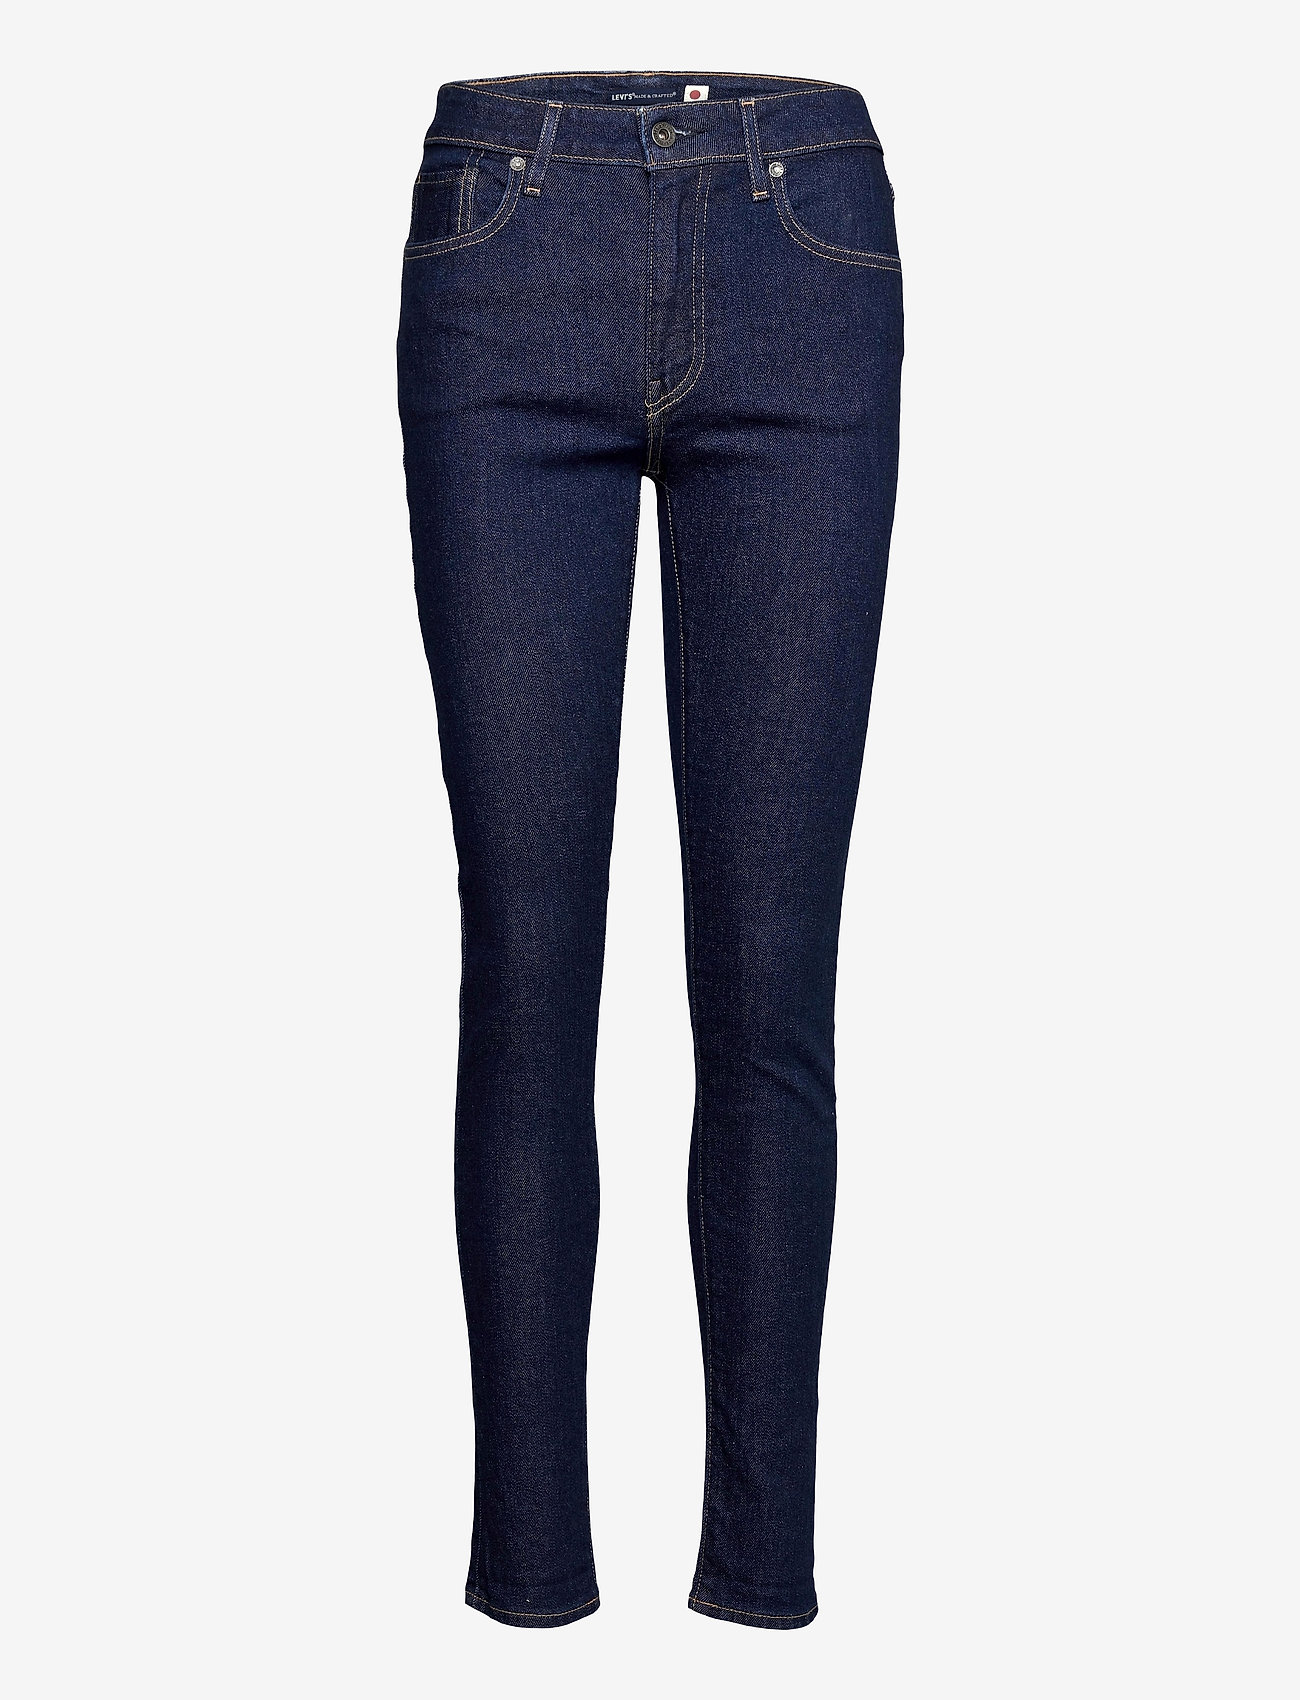 Levi's Made & Crafted - LMC 721 S LMC SKI SOFT RINSE - skinny jeans - dark indigo - flat finish - 0